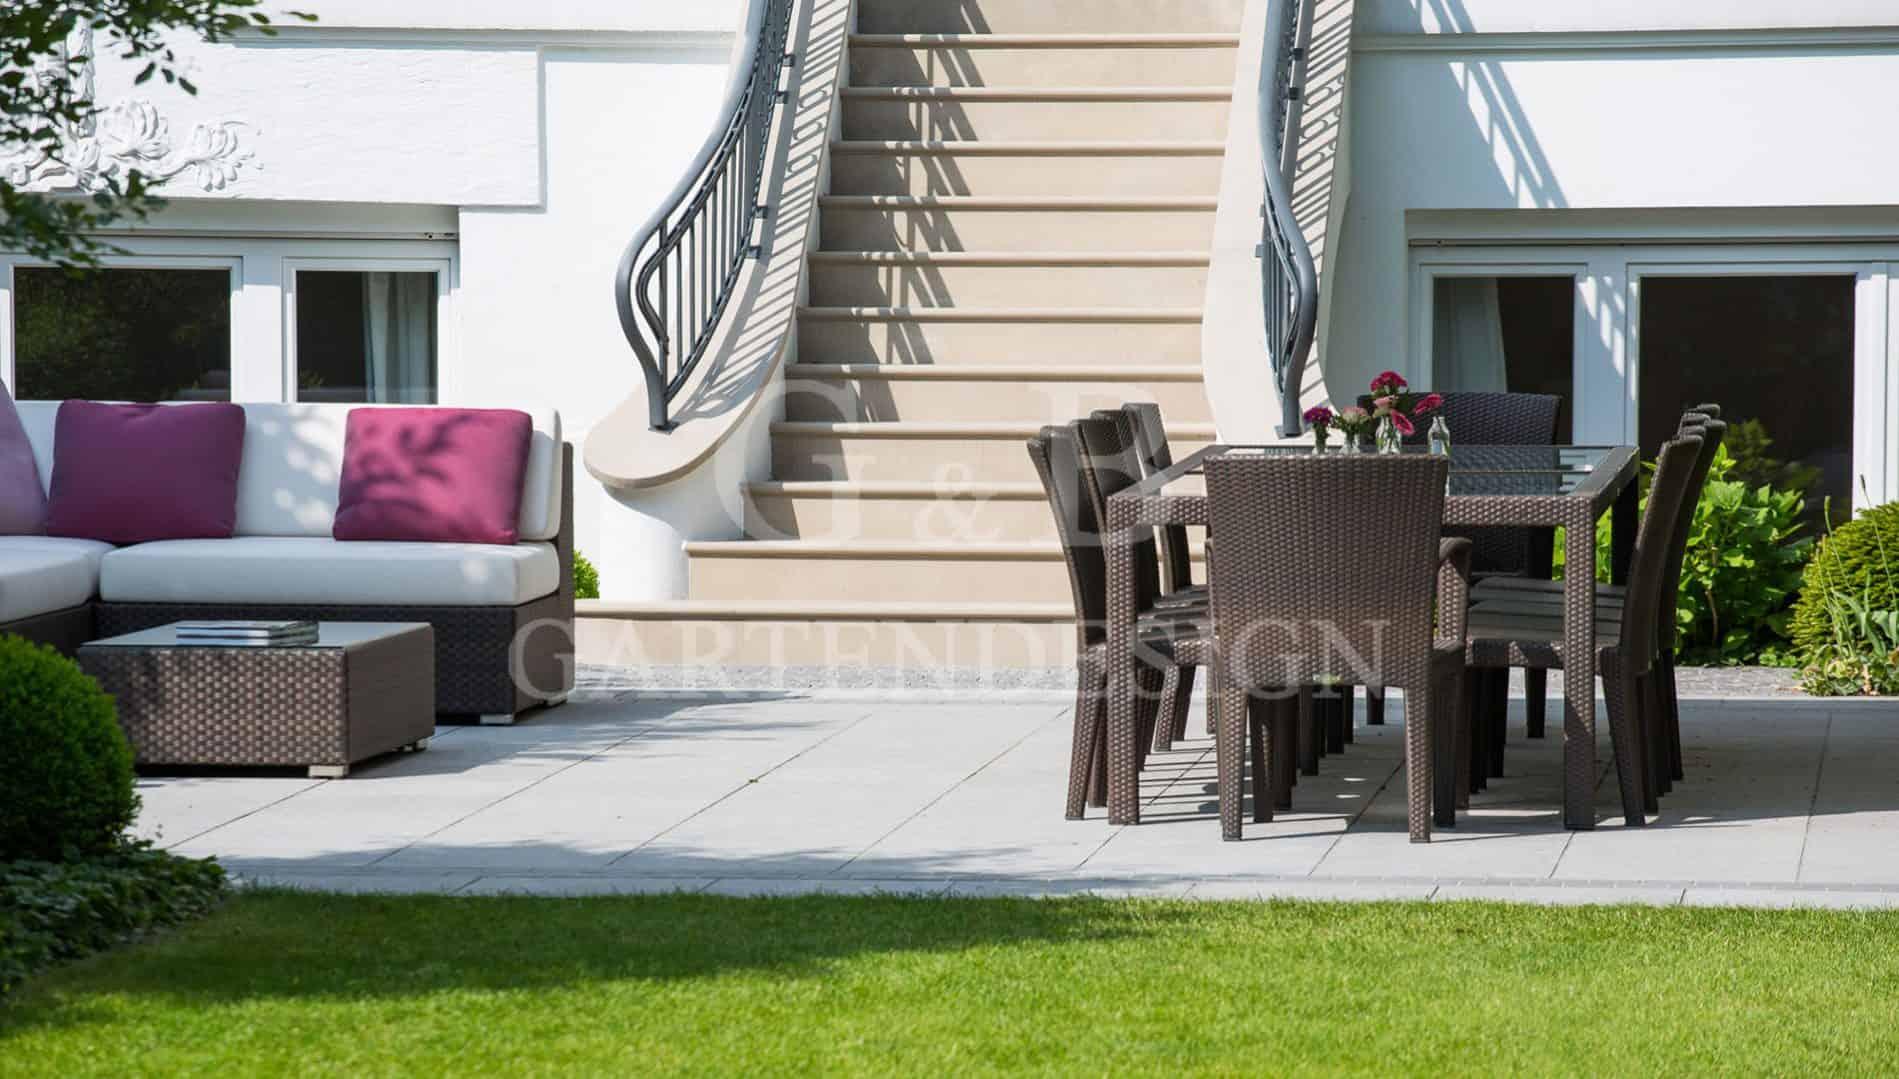 stadtvilla mit familiengarten hamburg gempp gartendesign. Black Bedroom Furniture Sets. Home Design Ideas